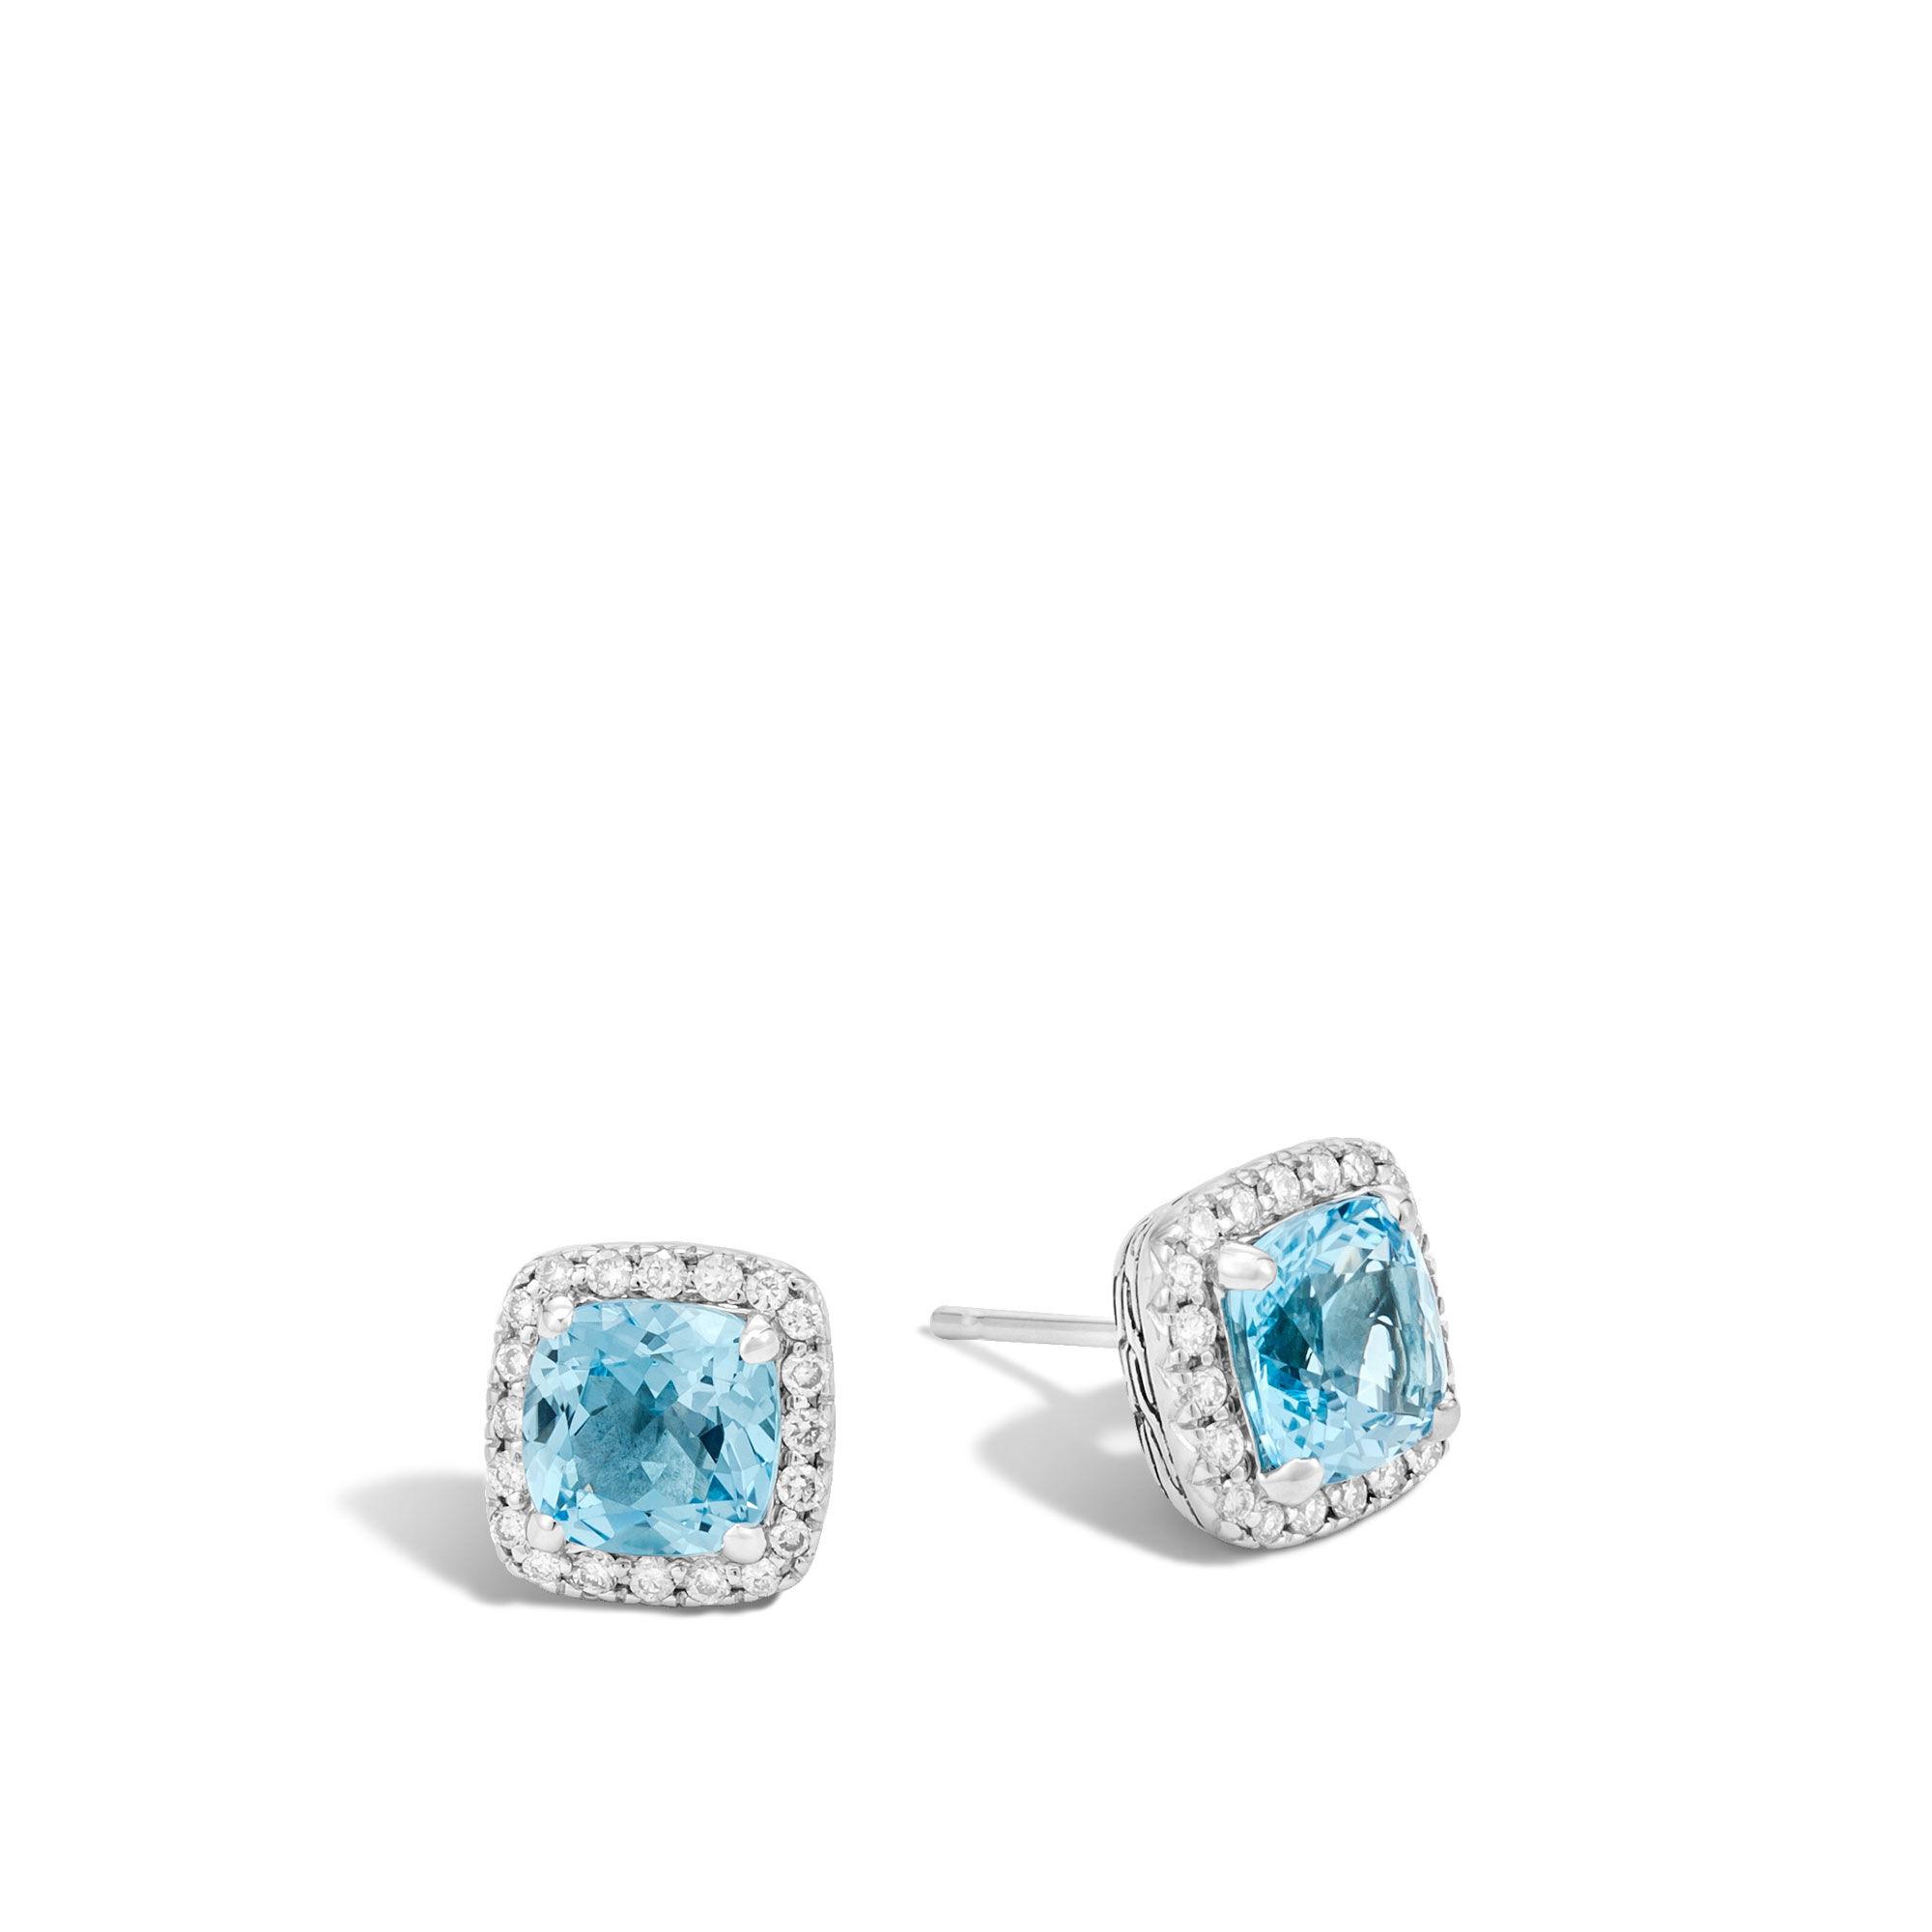 John Hardy Classic Chain Turquoise Stud Earrings h96IvvP4